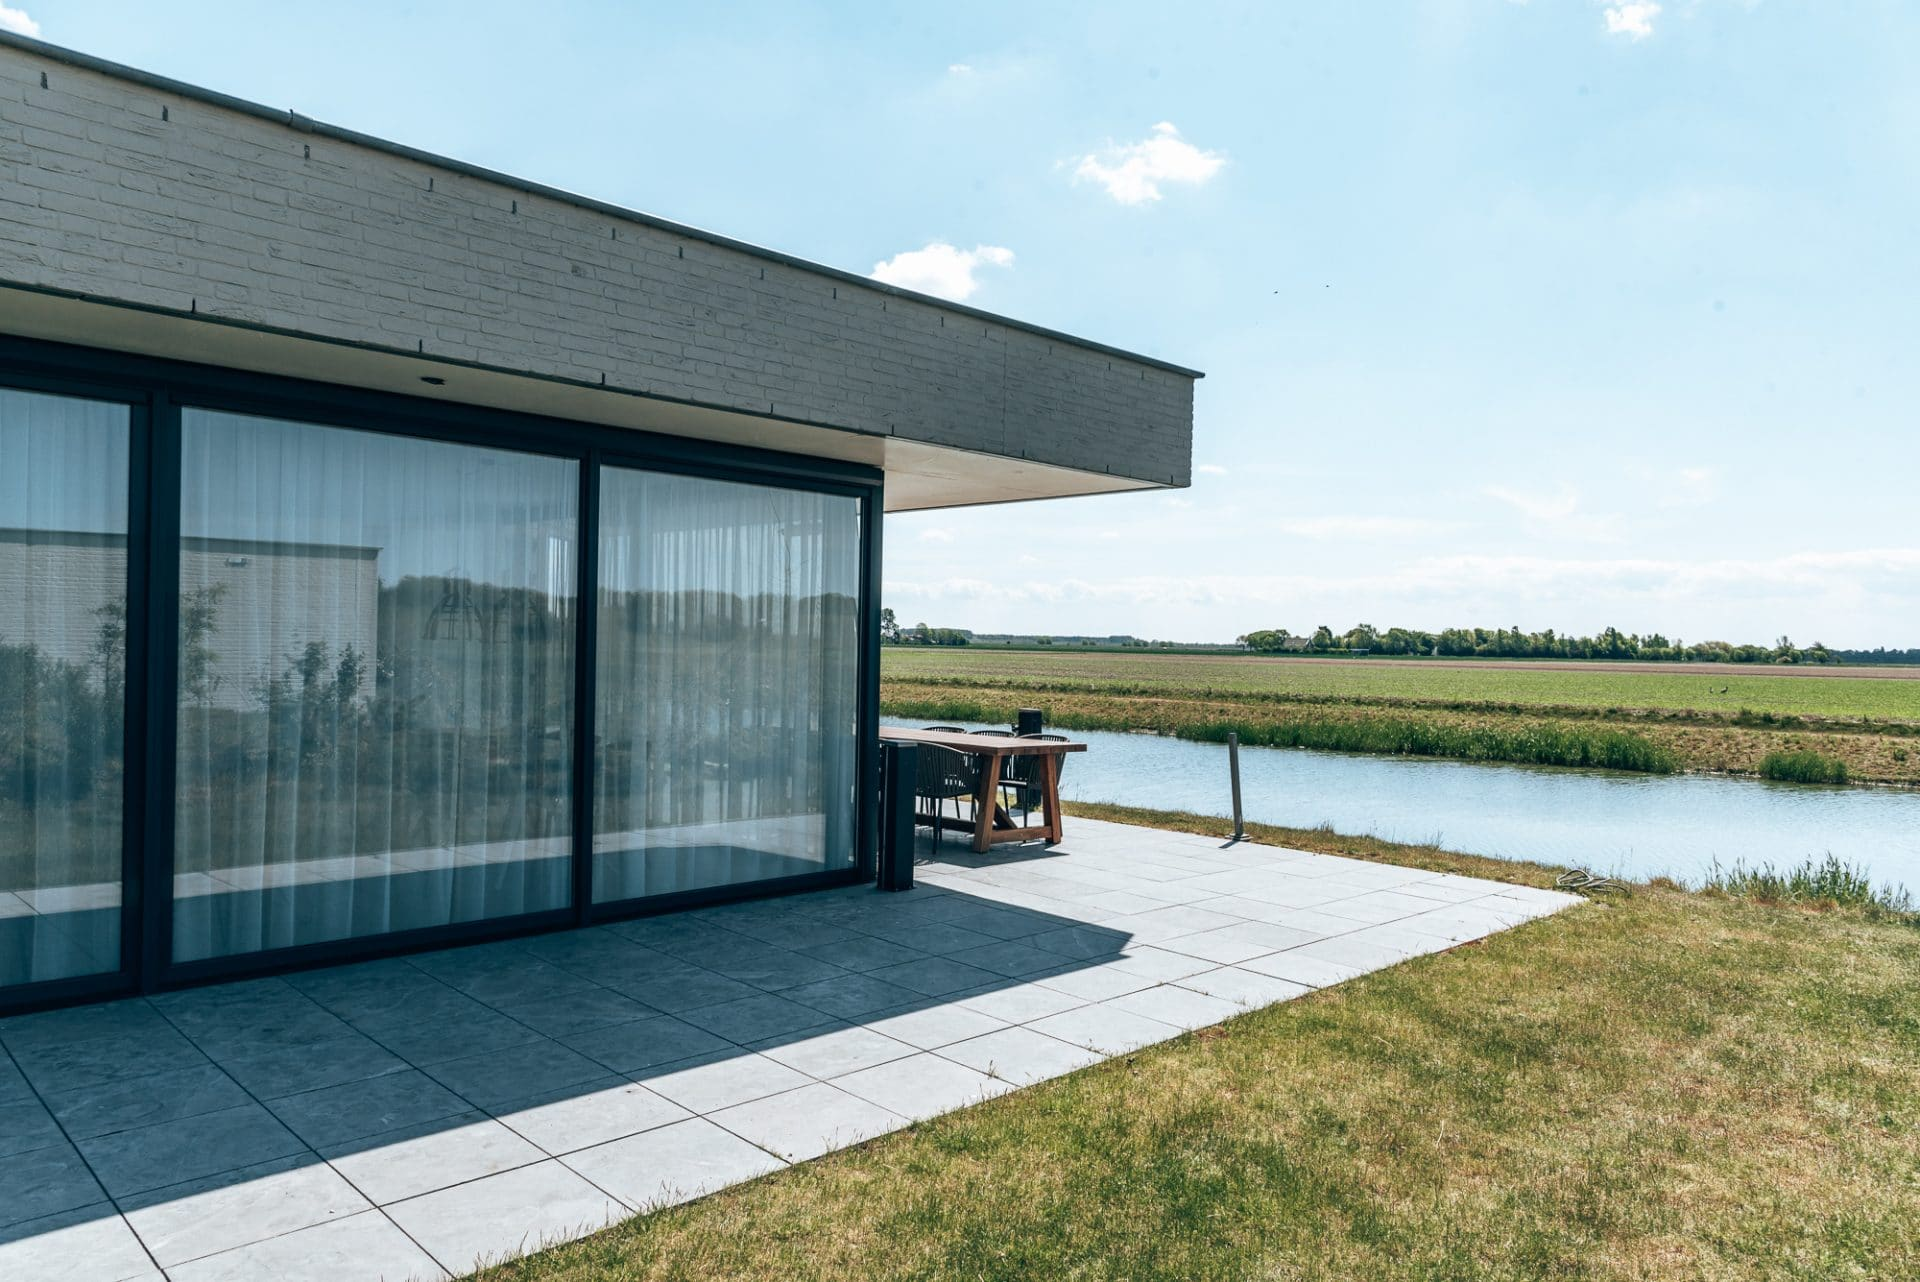 Luxury villa in Zeeland, the Netherlands with polder view